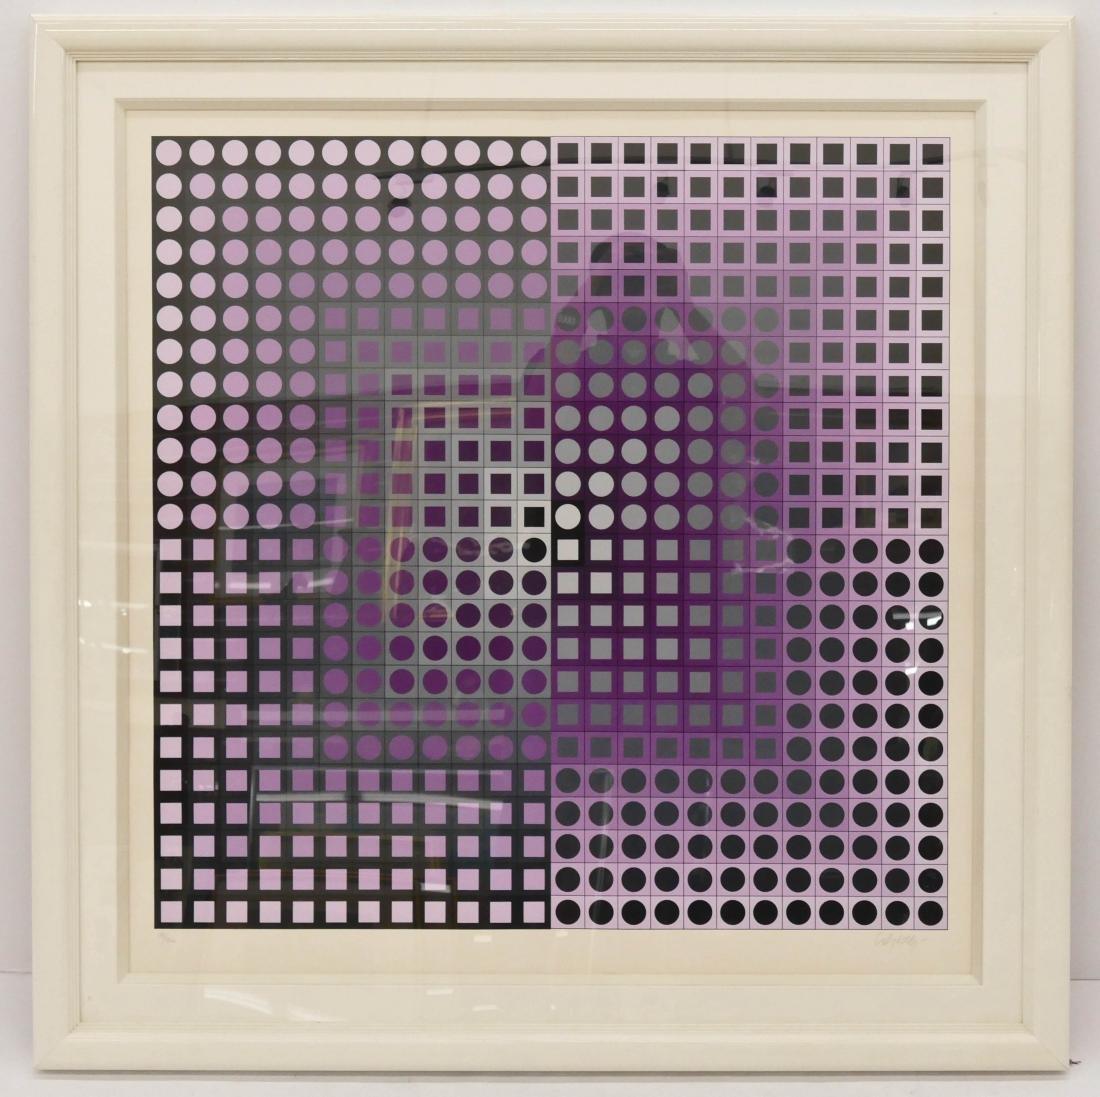 Victor Vasarely ''Zett'' 1989 Diptych Serigraph - 2